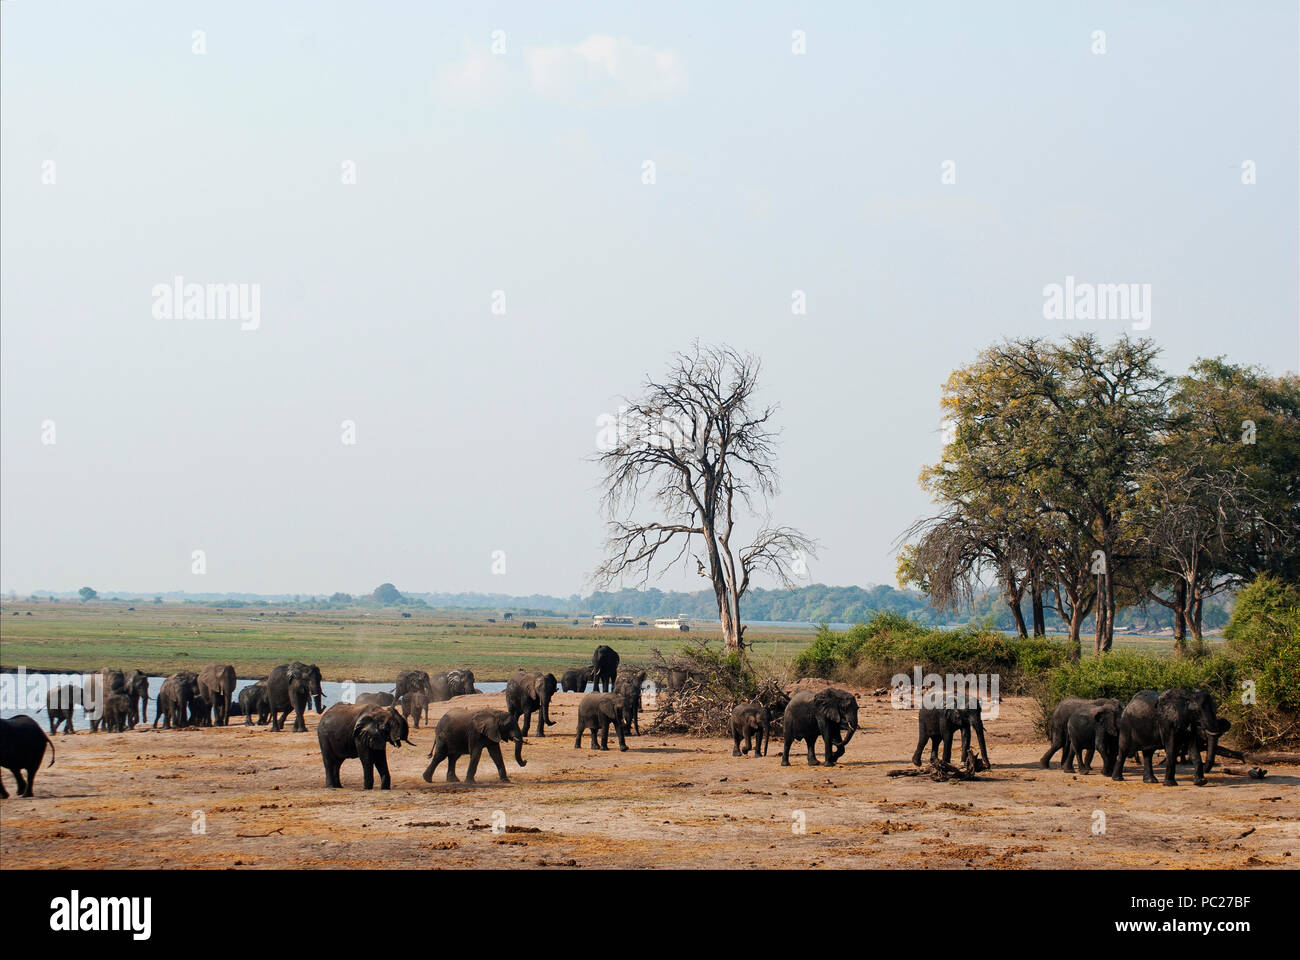 Herd of elephants at the banks of the Chobe river, Cobe National Park, Botswana - Stock Image